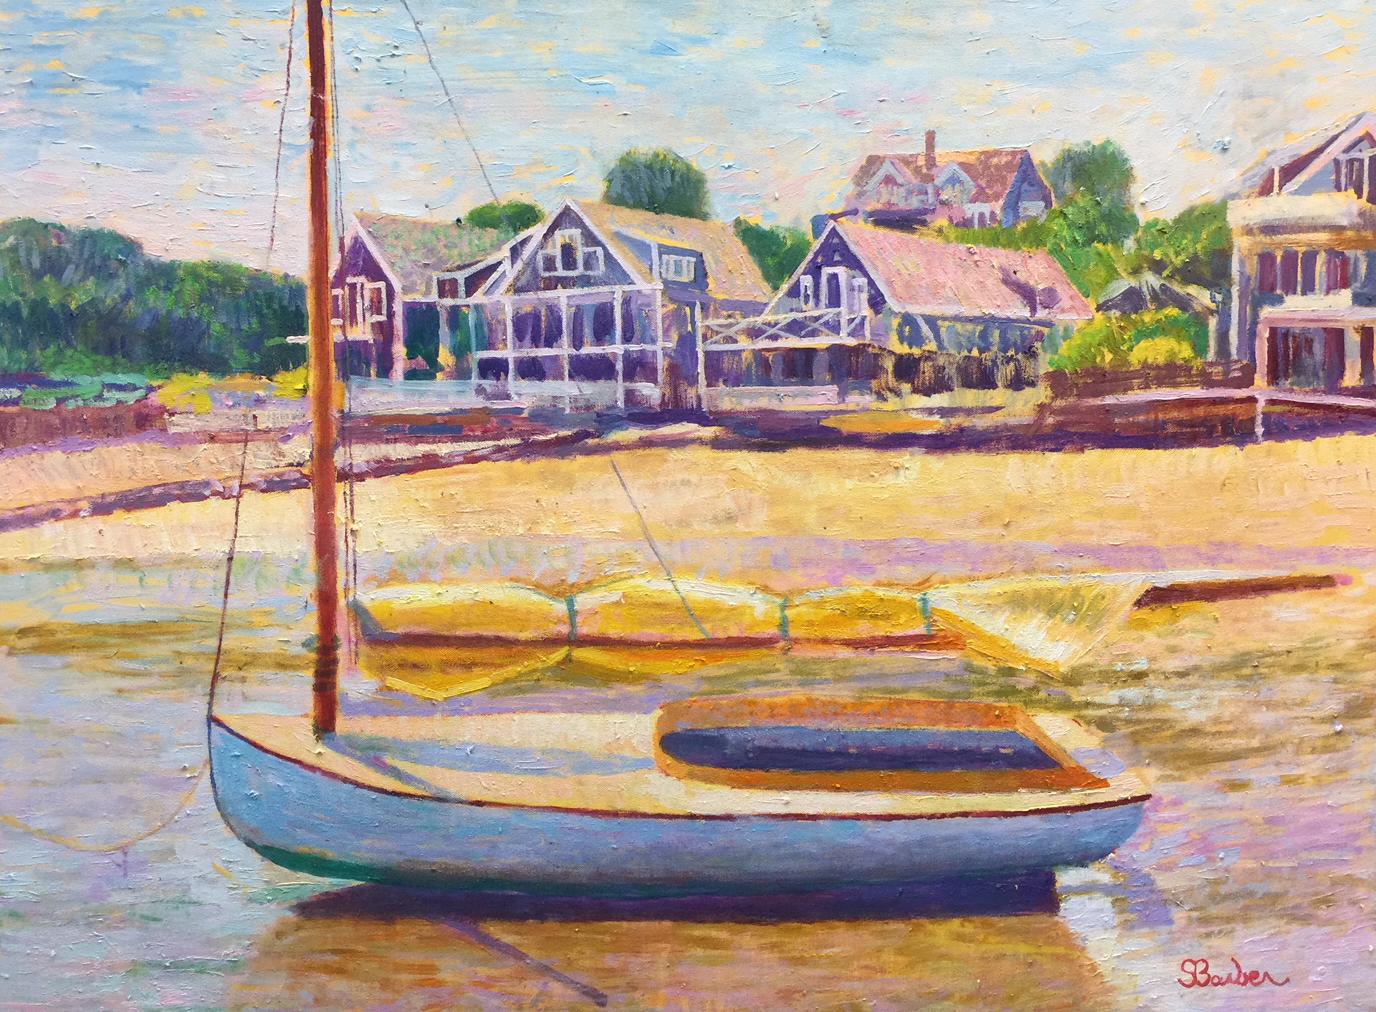 Low Tide  |  30 x 40  |  Oil on canvas